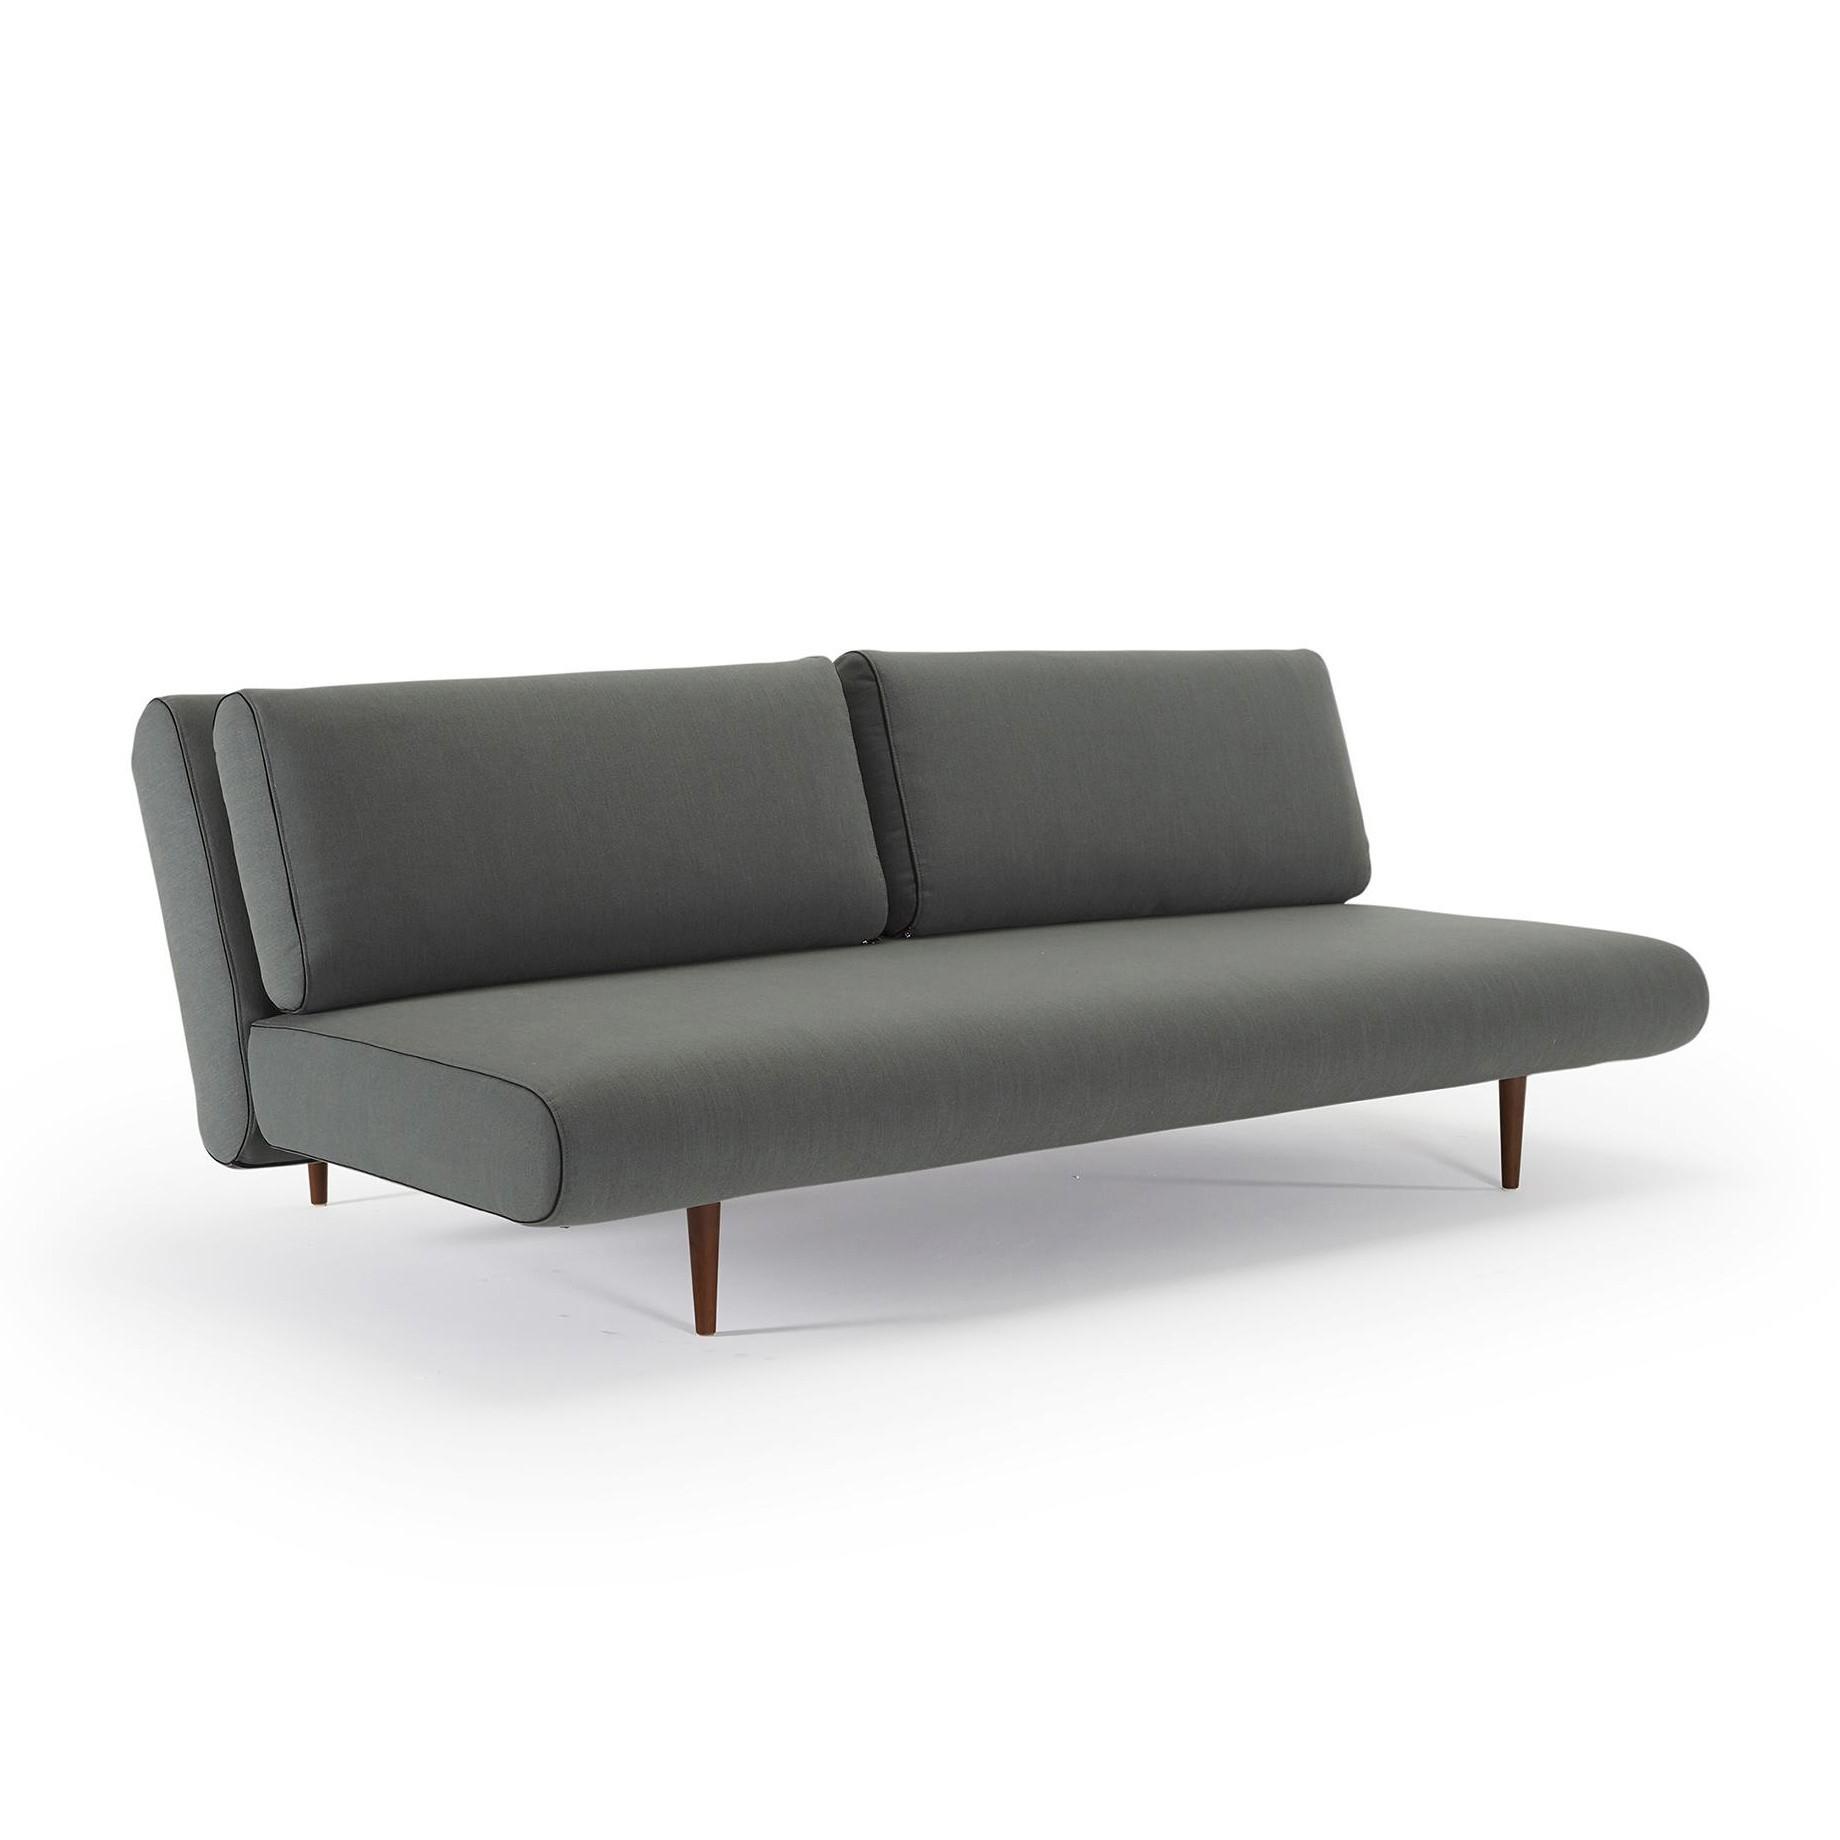 Innovation Unfurl Lounger Sofa Bed